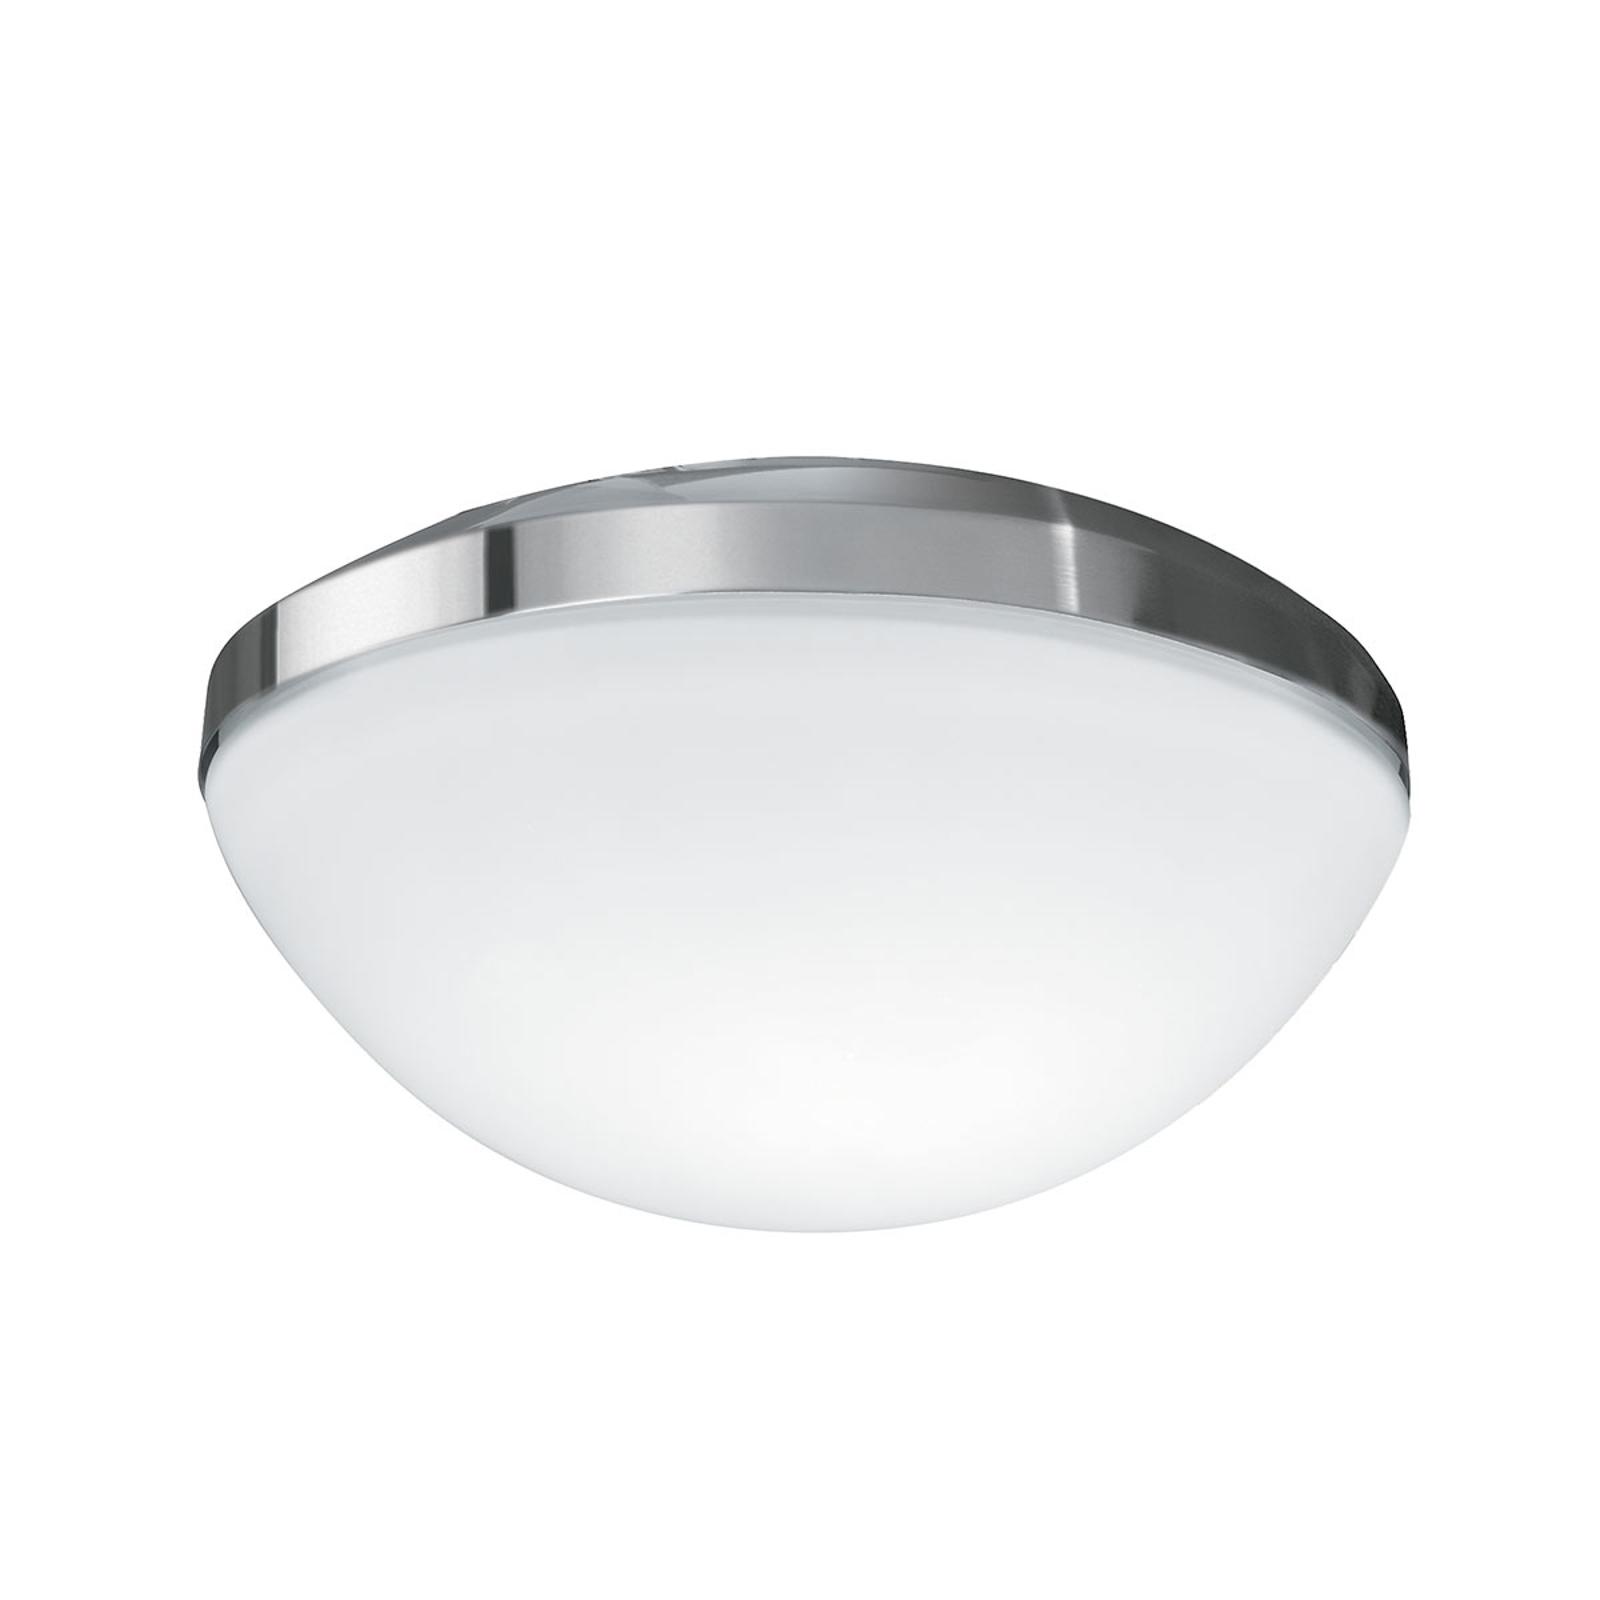 Hunter Contemporary Light Kit ventilatorer nikkel